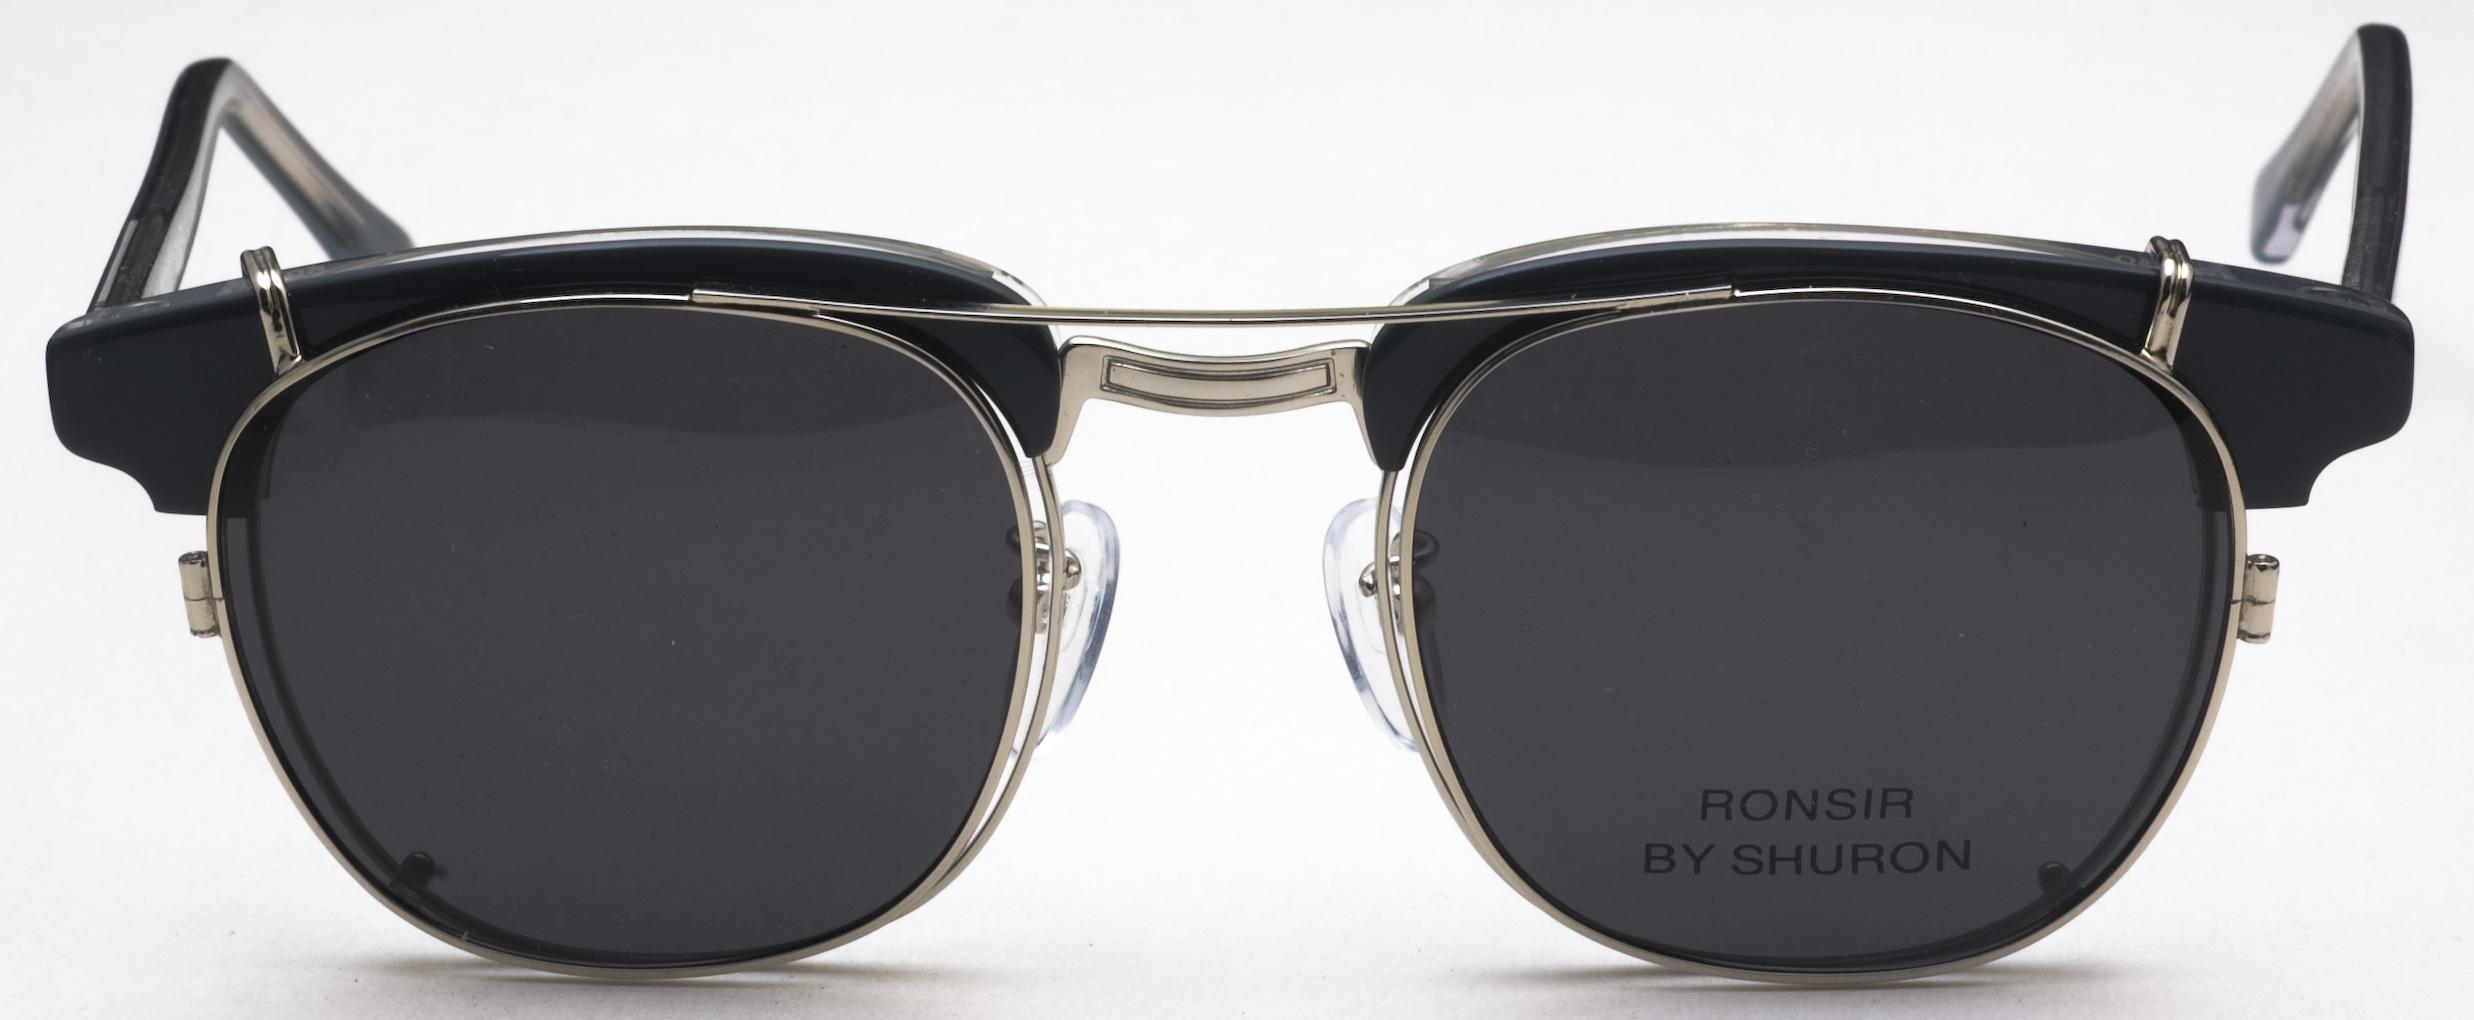 567e09a670ec $130 - Ronsir CLIP ON Polarized Sunglasses, Silver with Grey Lenses ...